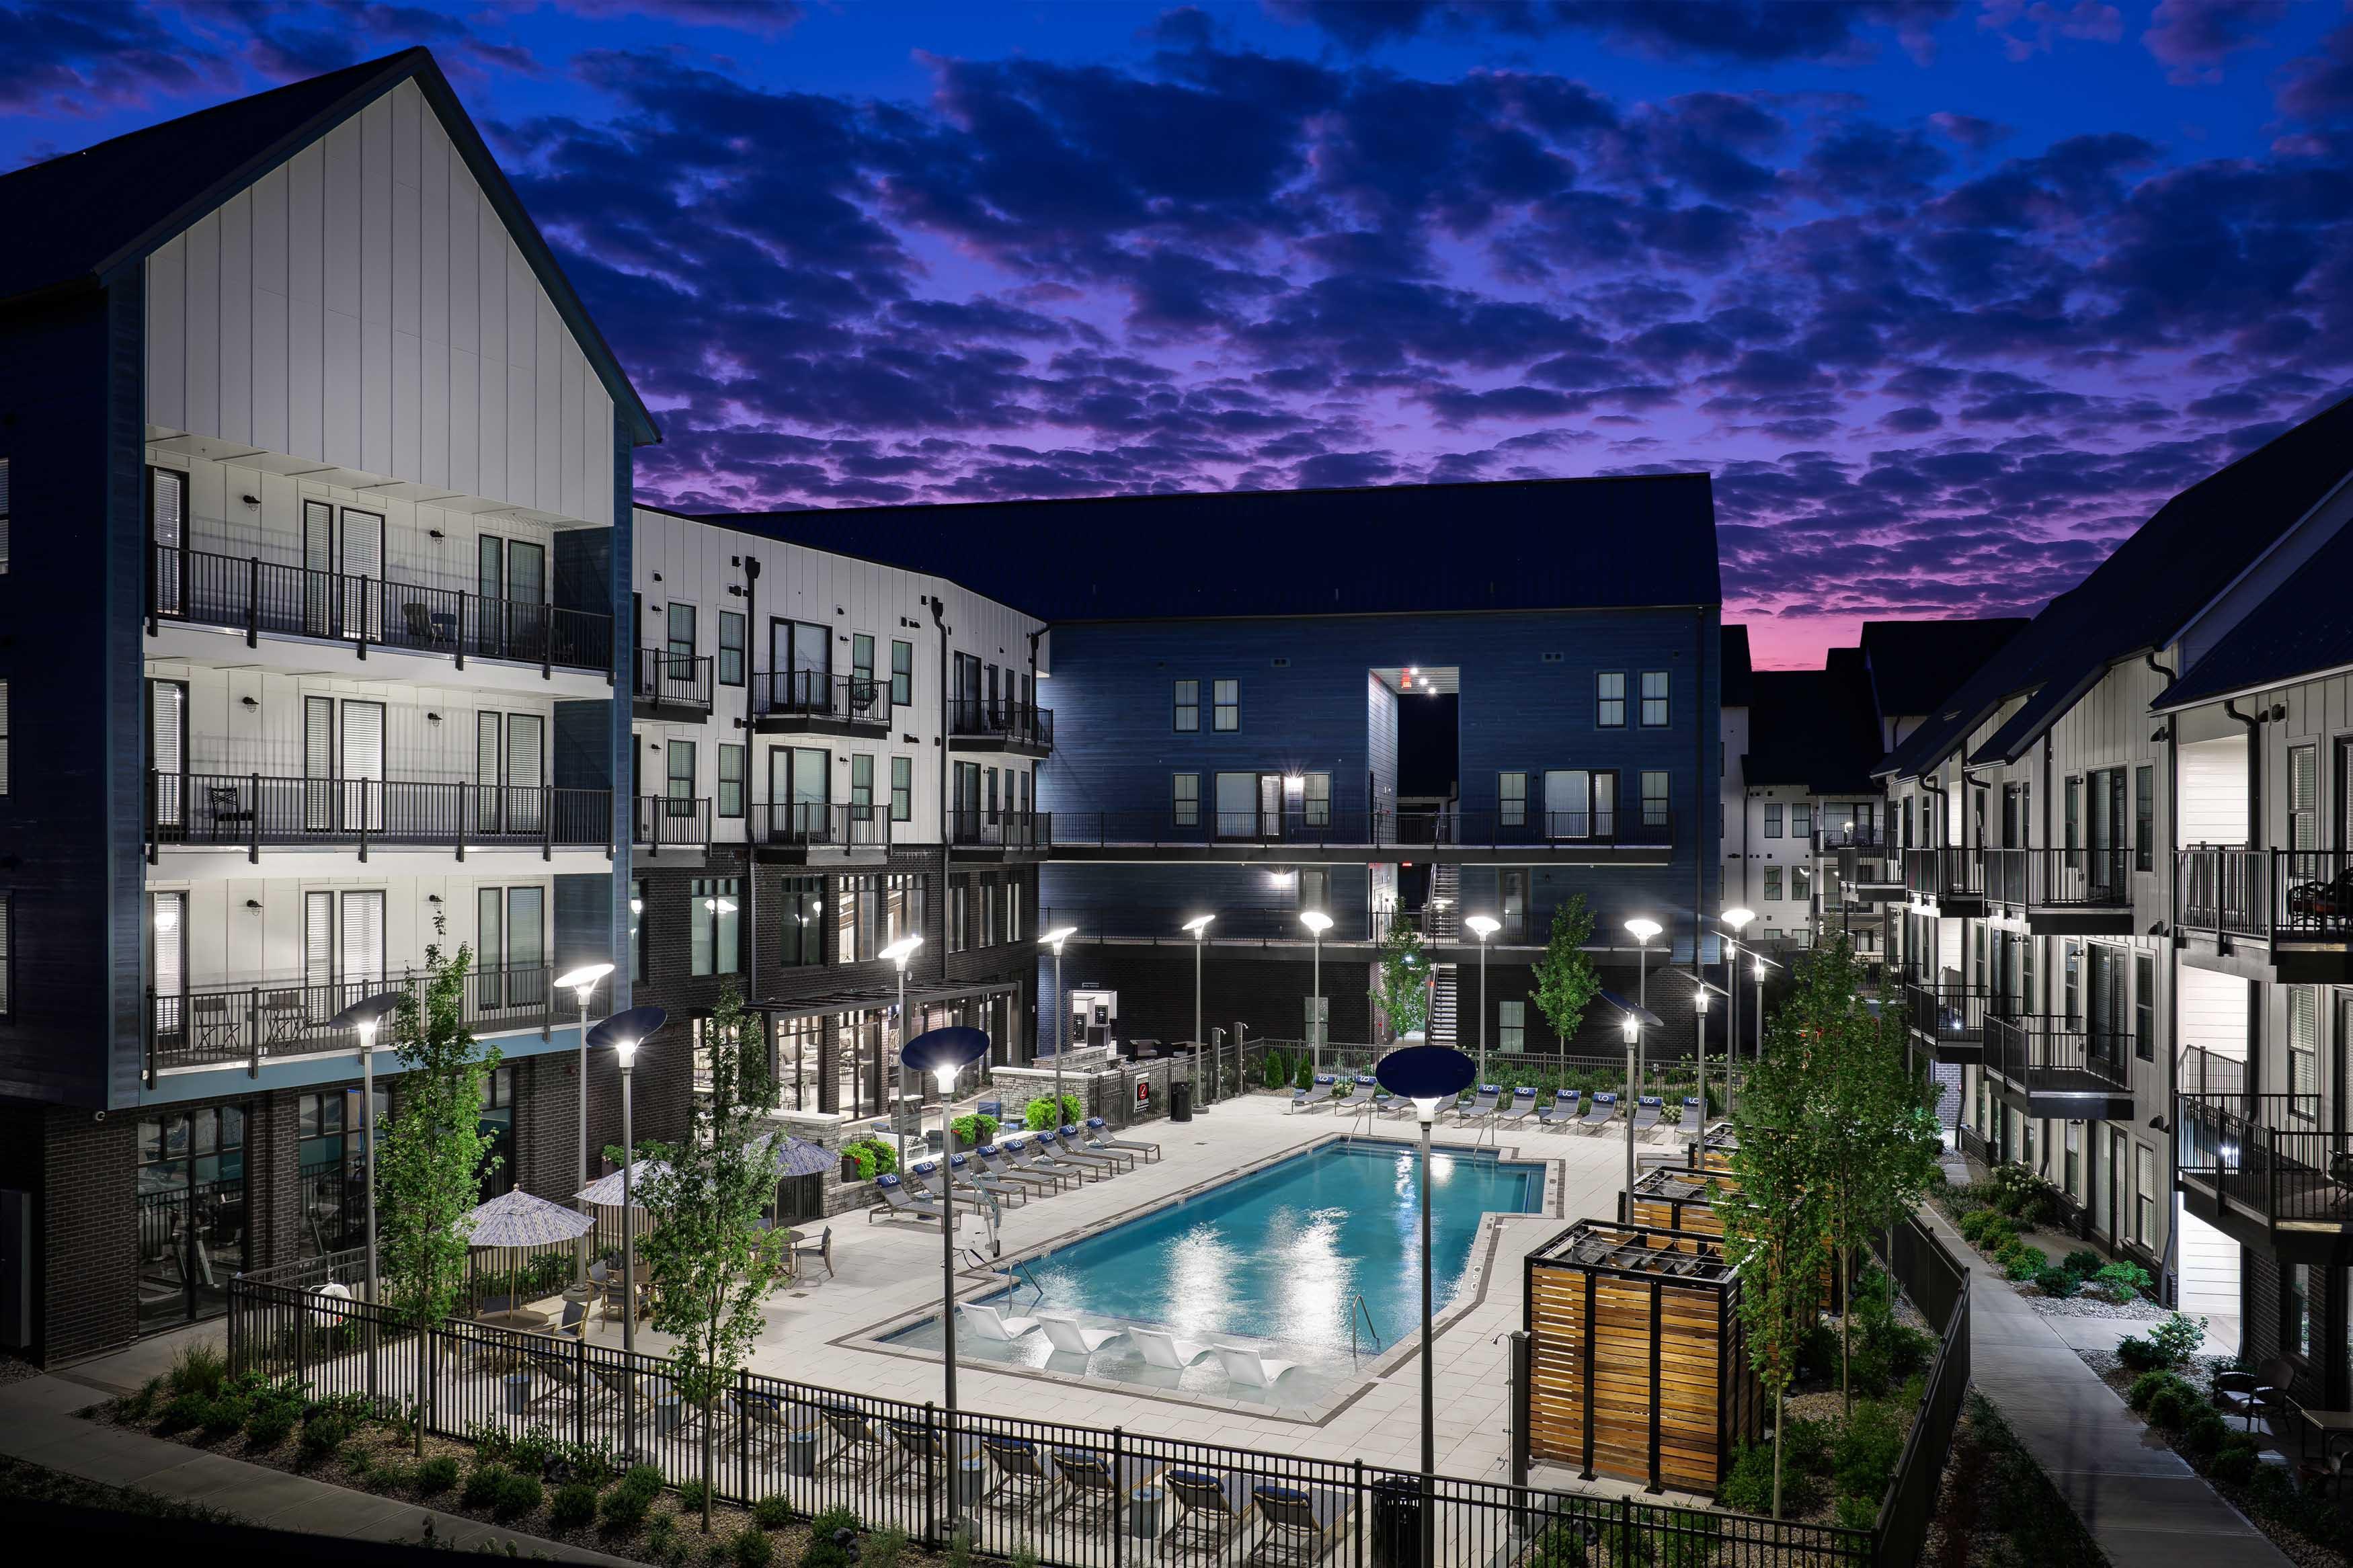 Apartments Near Kentucky Upton Oxmoor Apartments for Kentucky Students in , KY